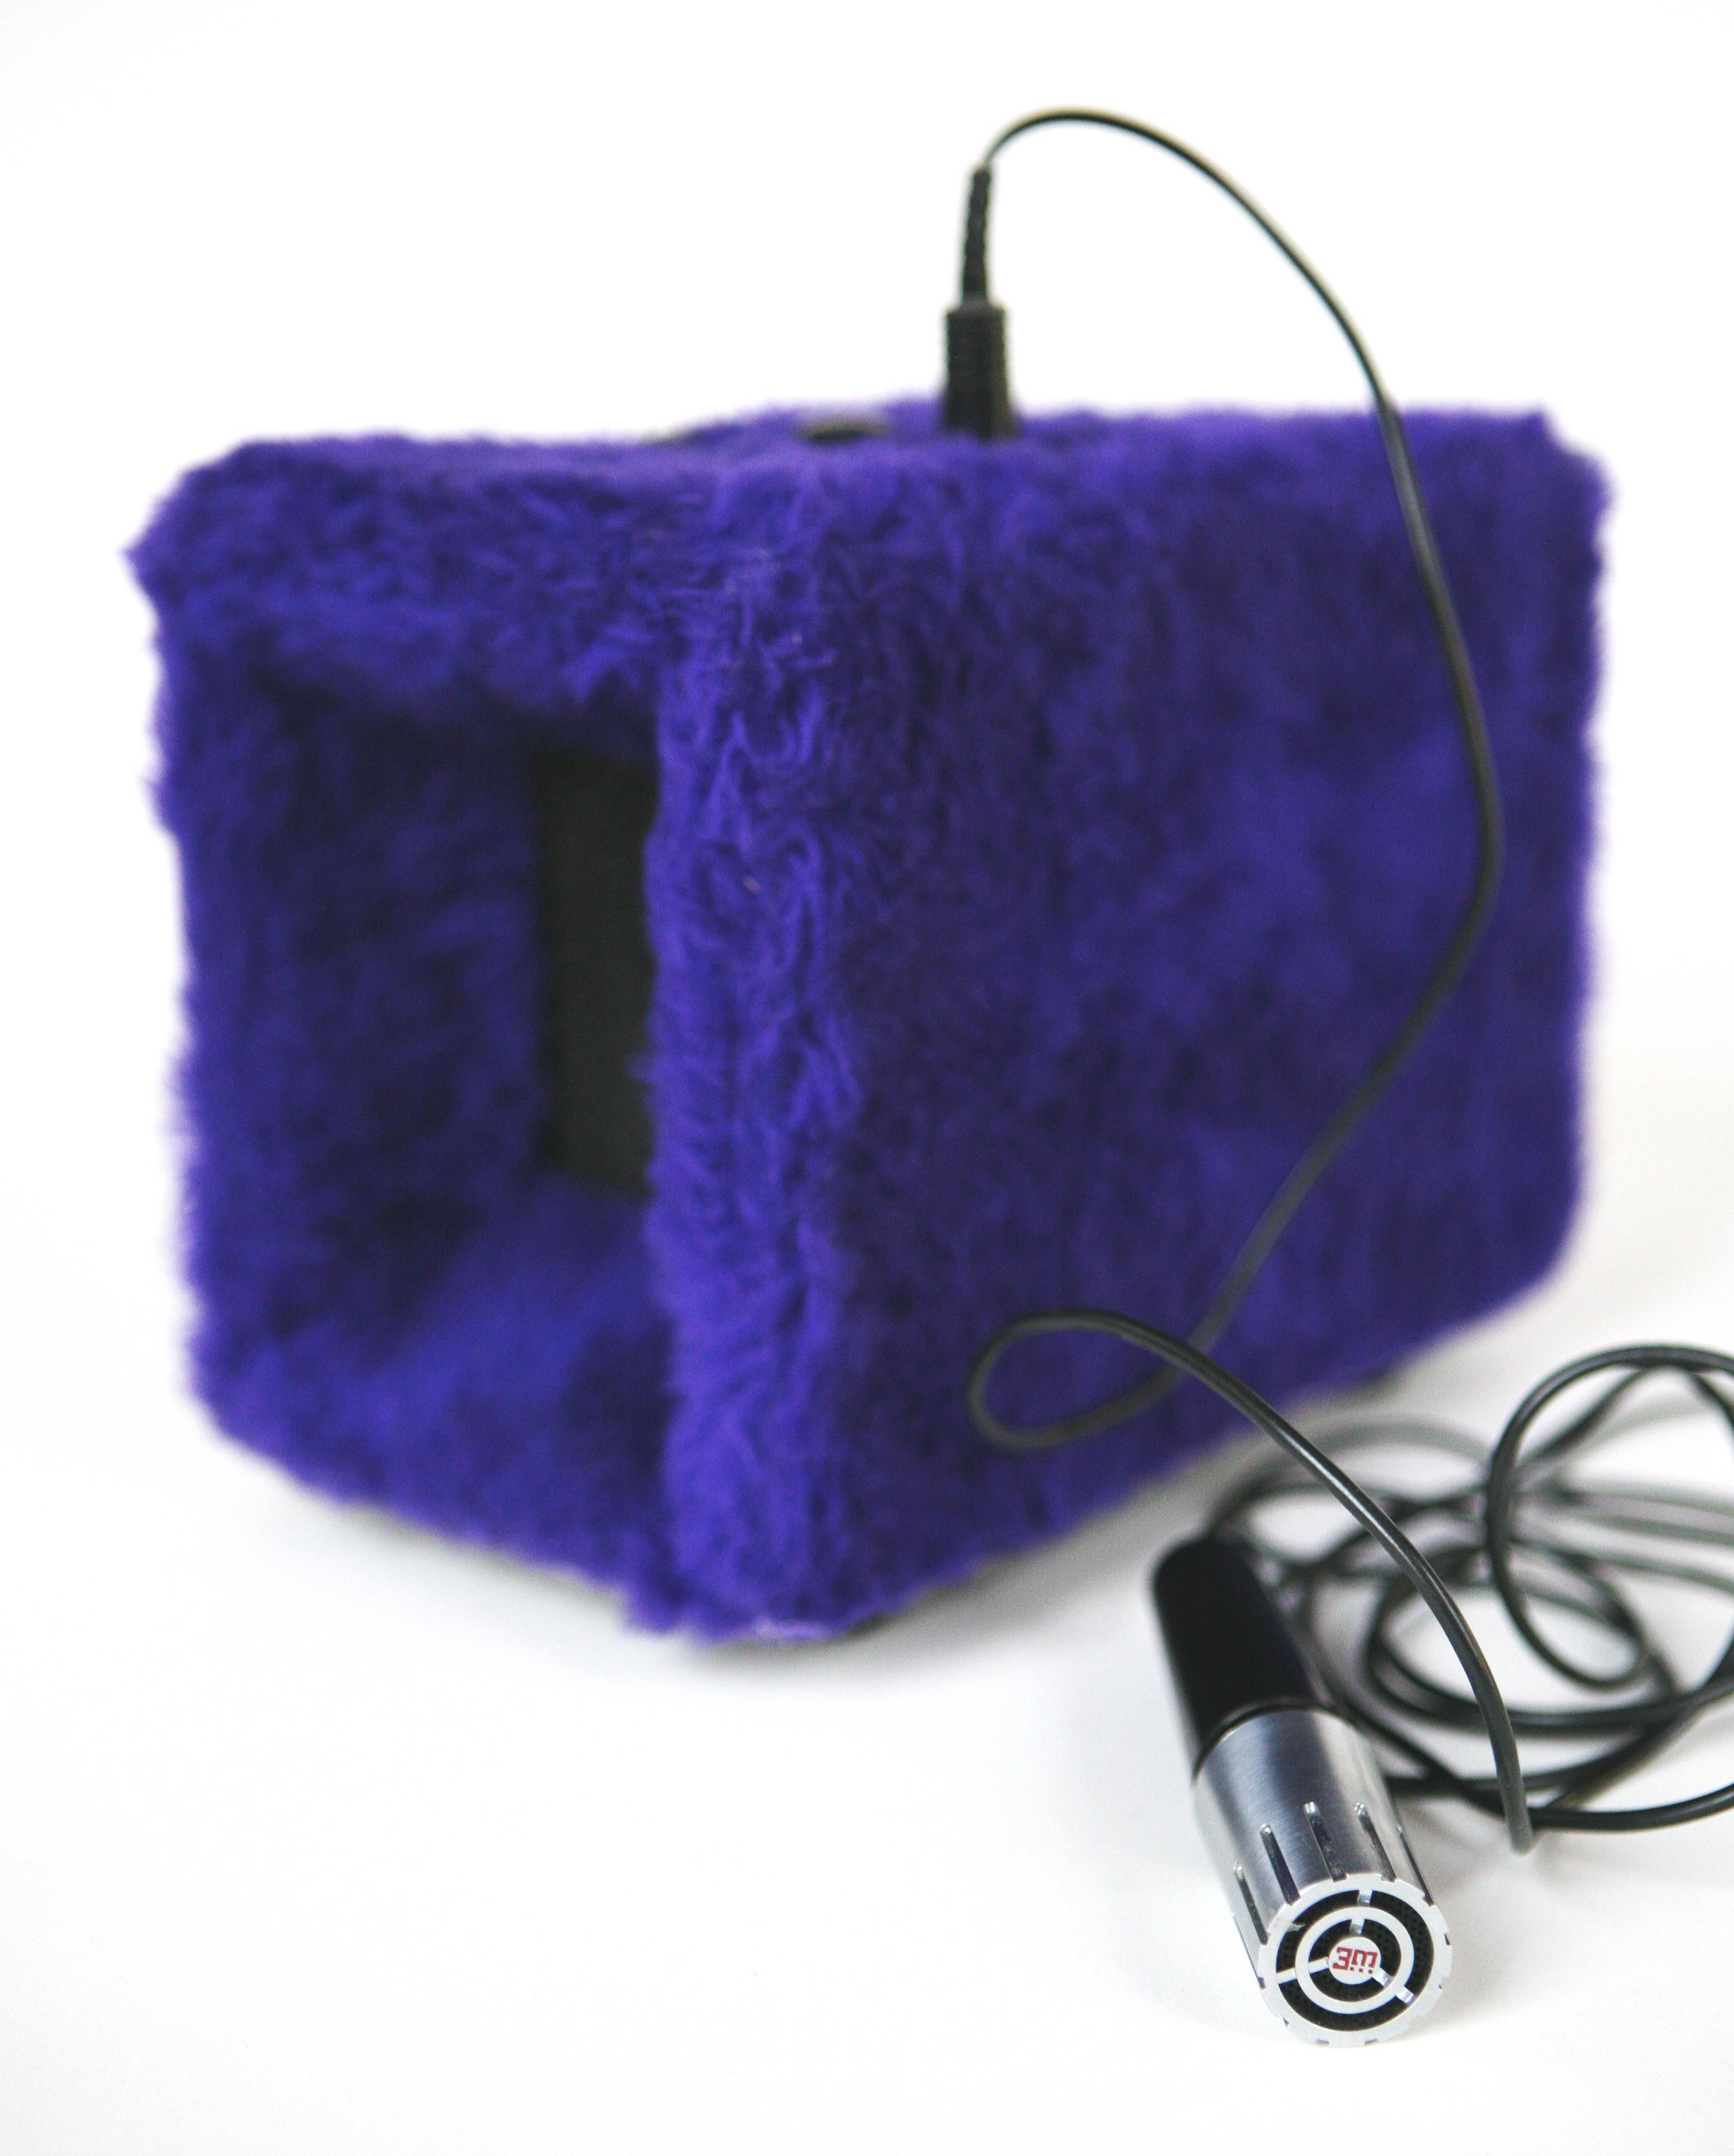 https://0201.nccdn.net/1_2/000/000/17e/122/purple.jpg